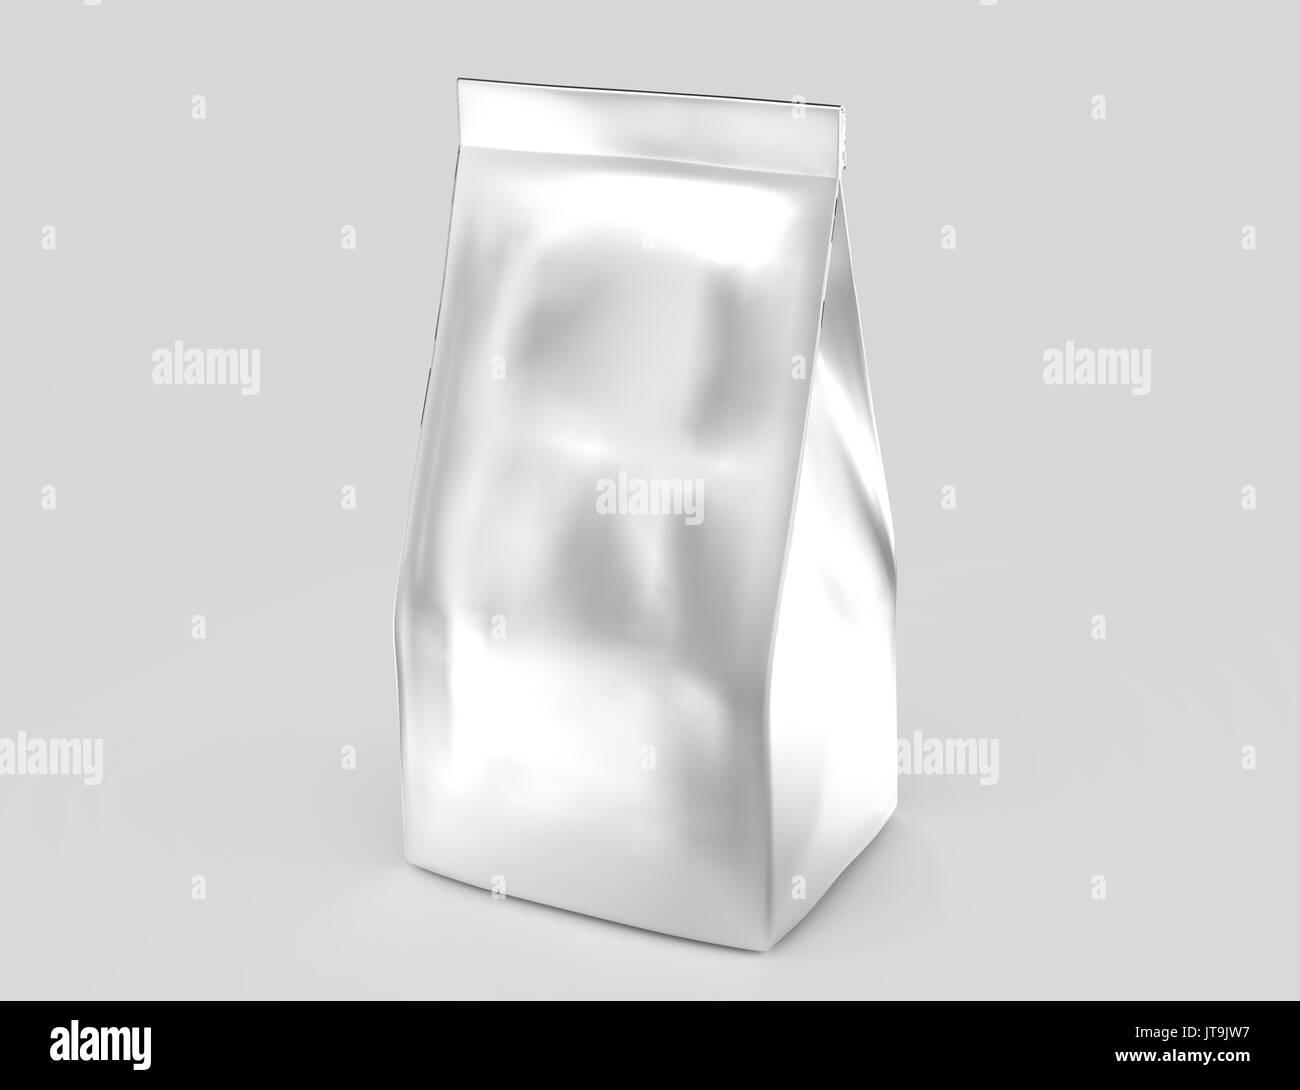 Silver coffee bean bag mockup, blank foil bag template in 3d rendering - Stock Image